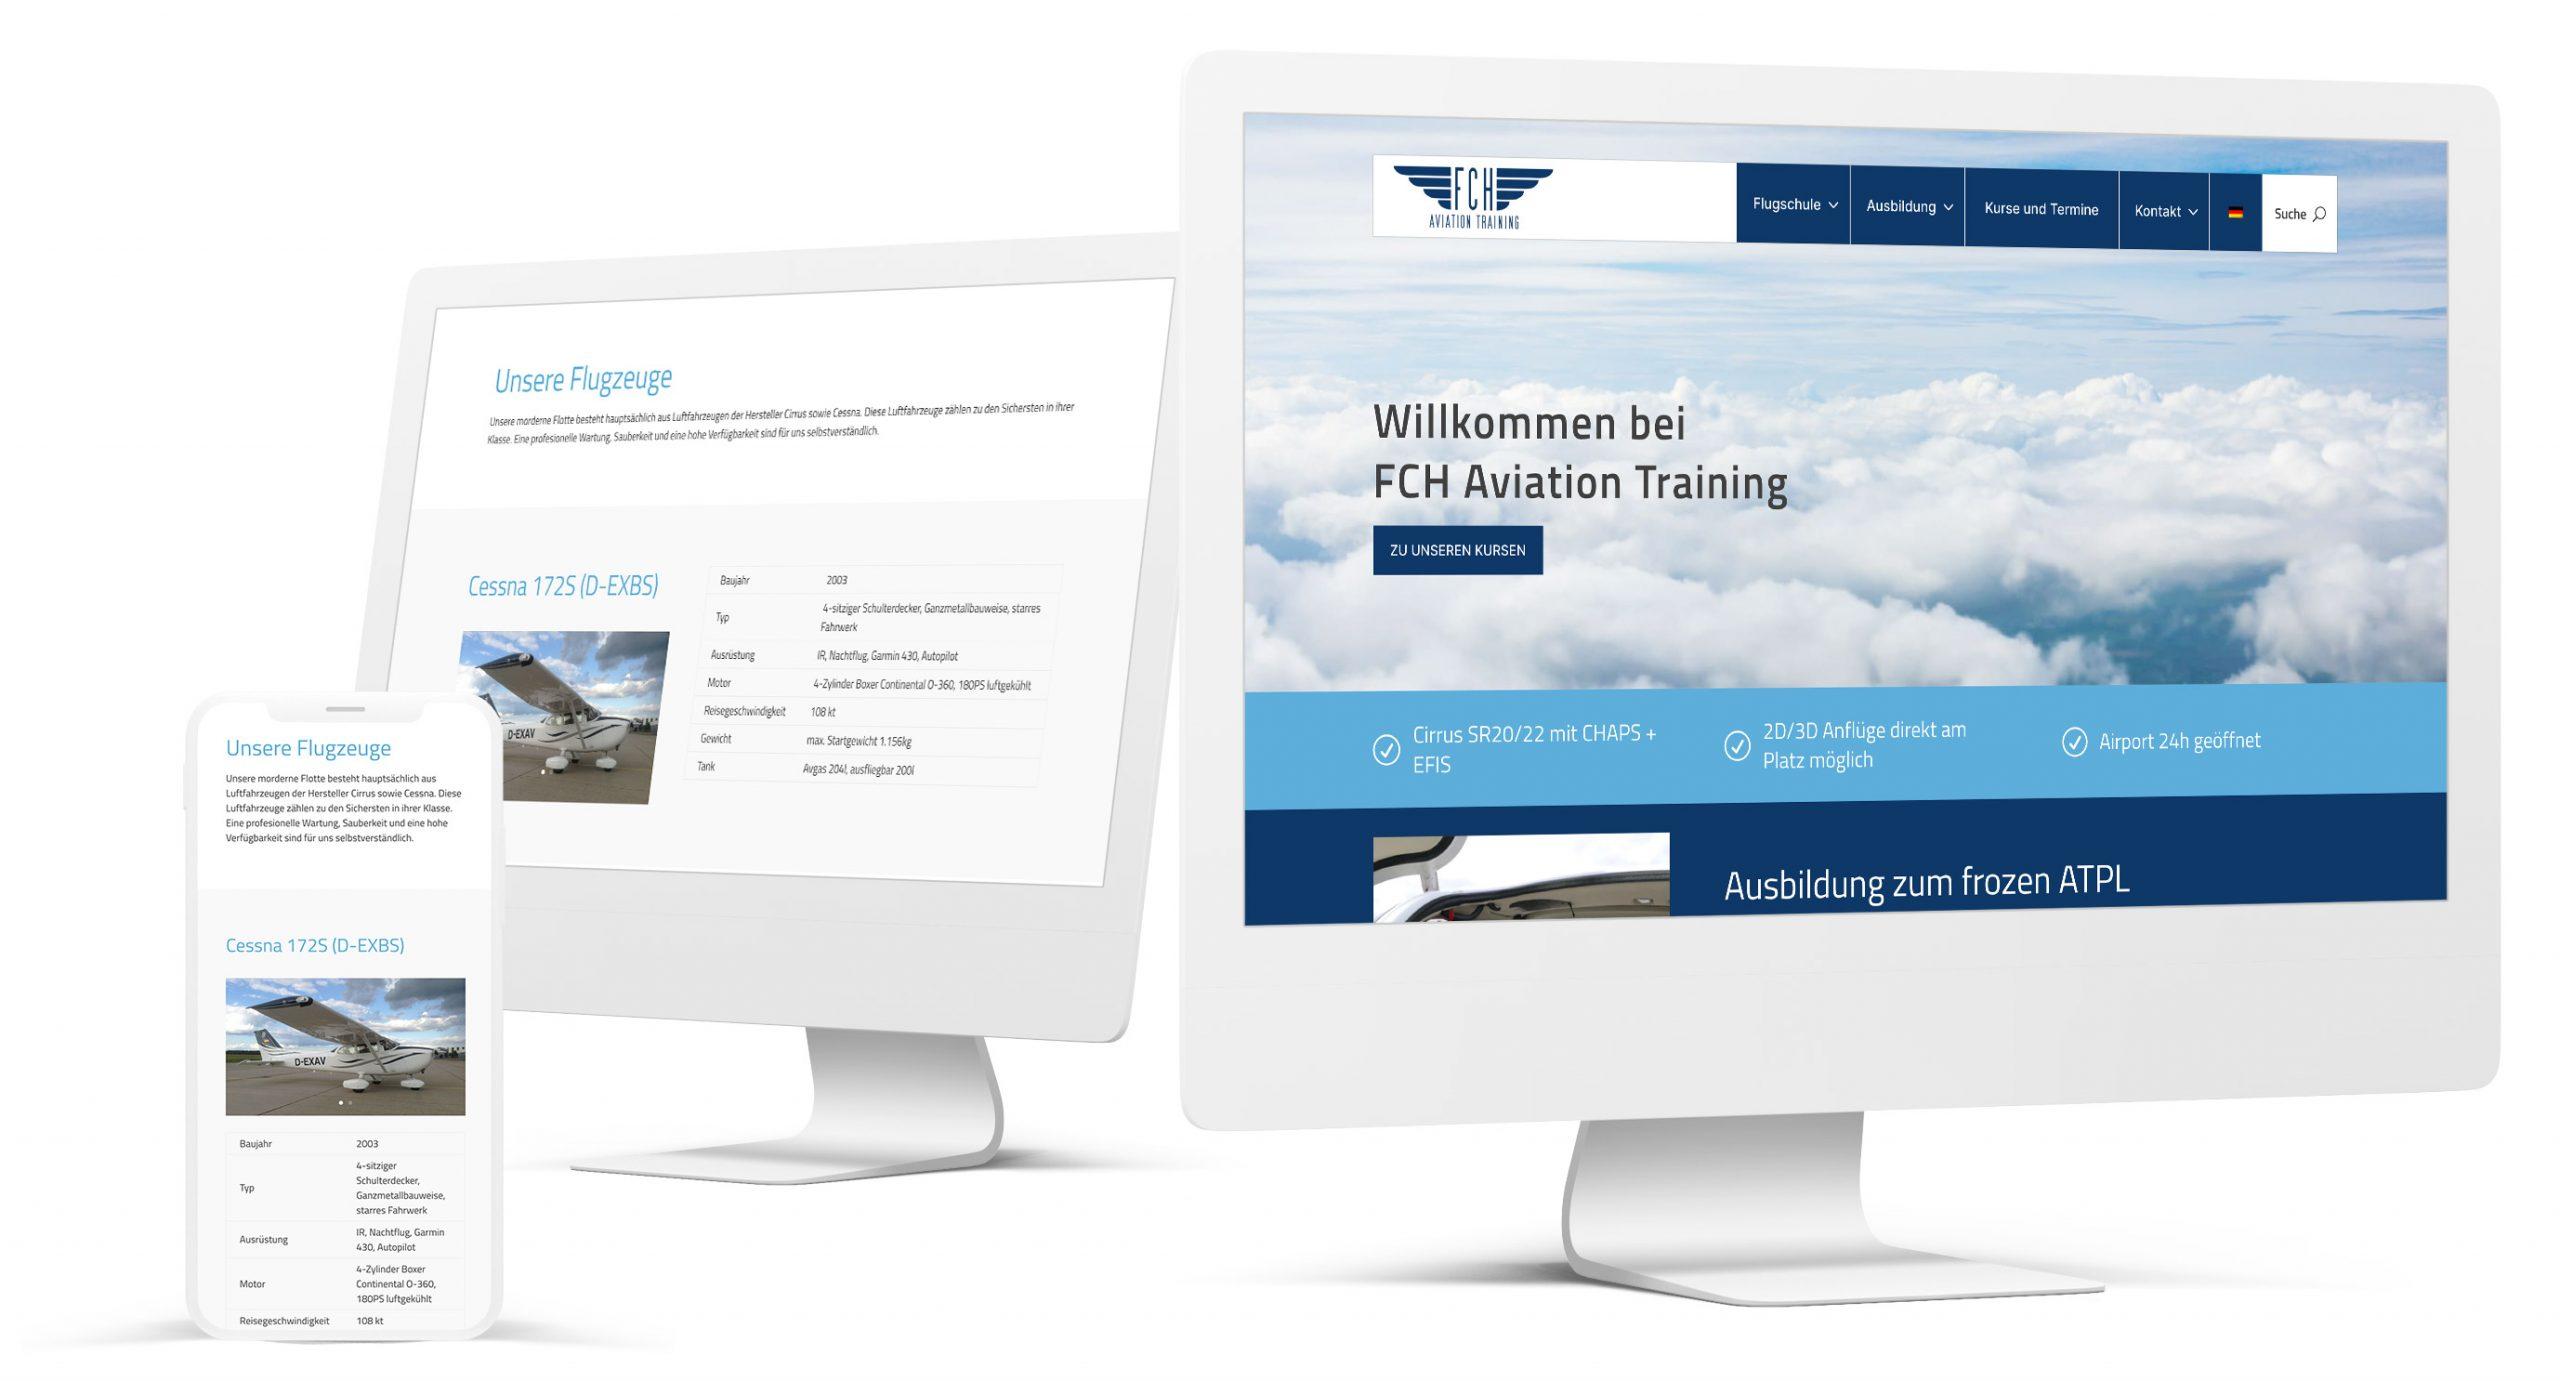 FCH Aviation Training Flugschule